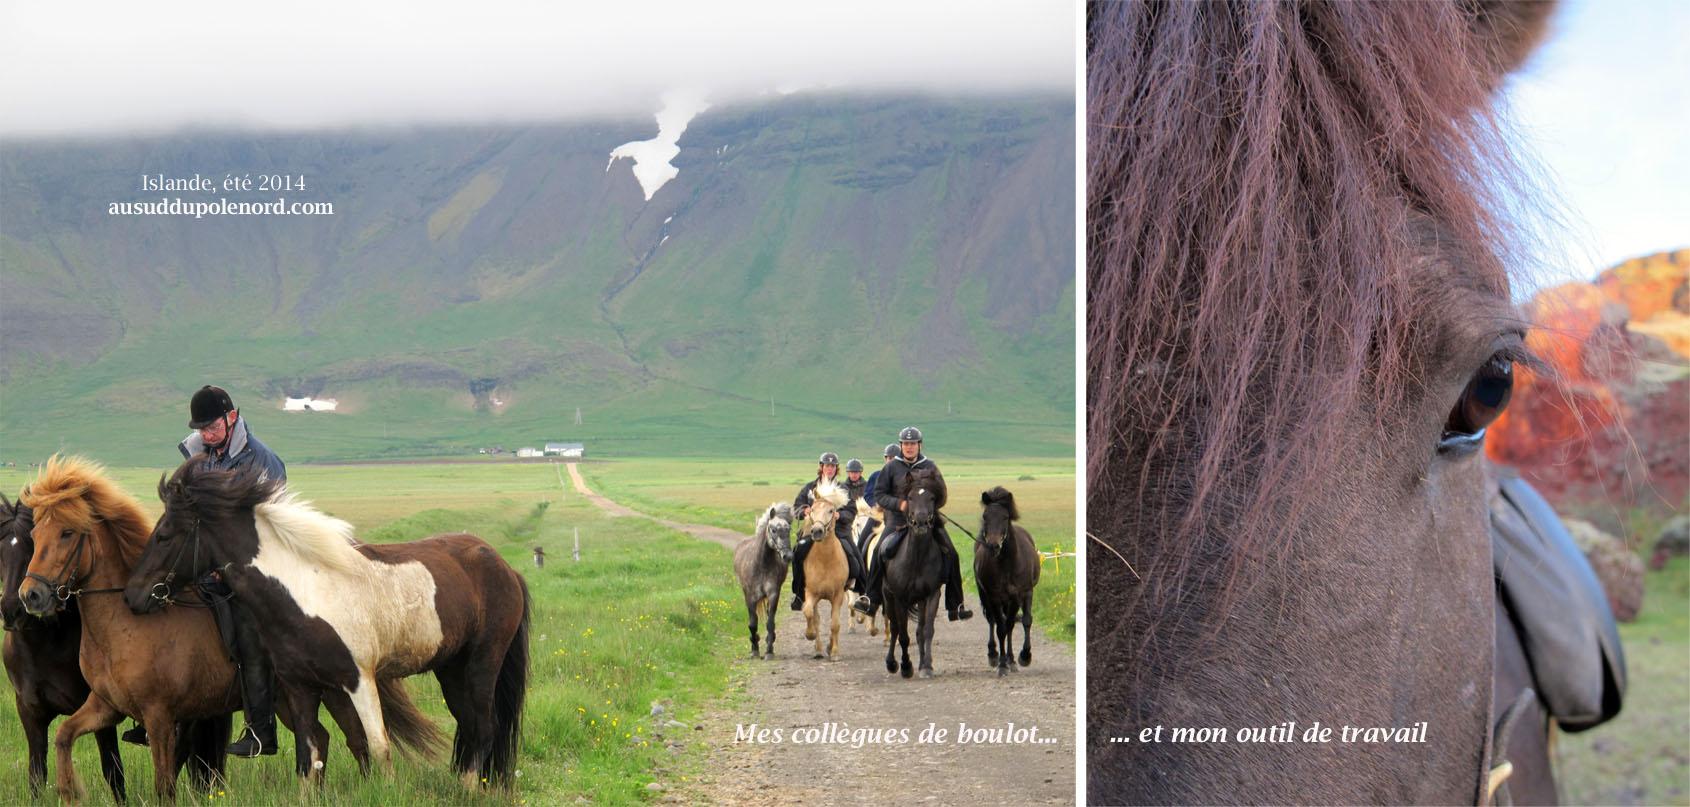 islande univers de taf